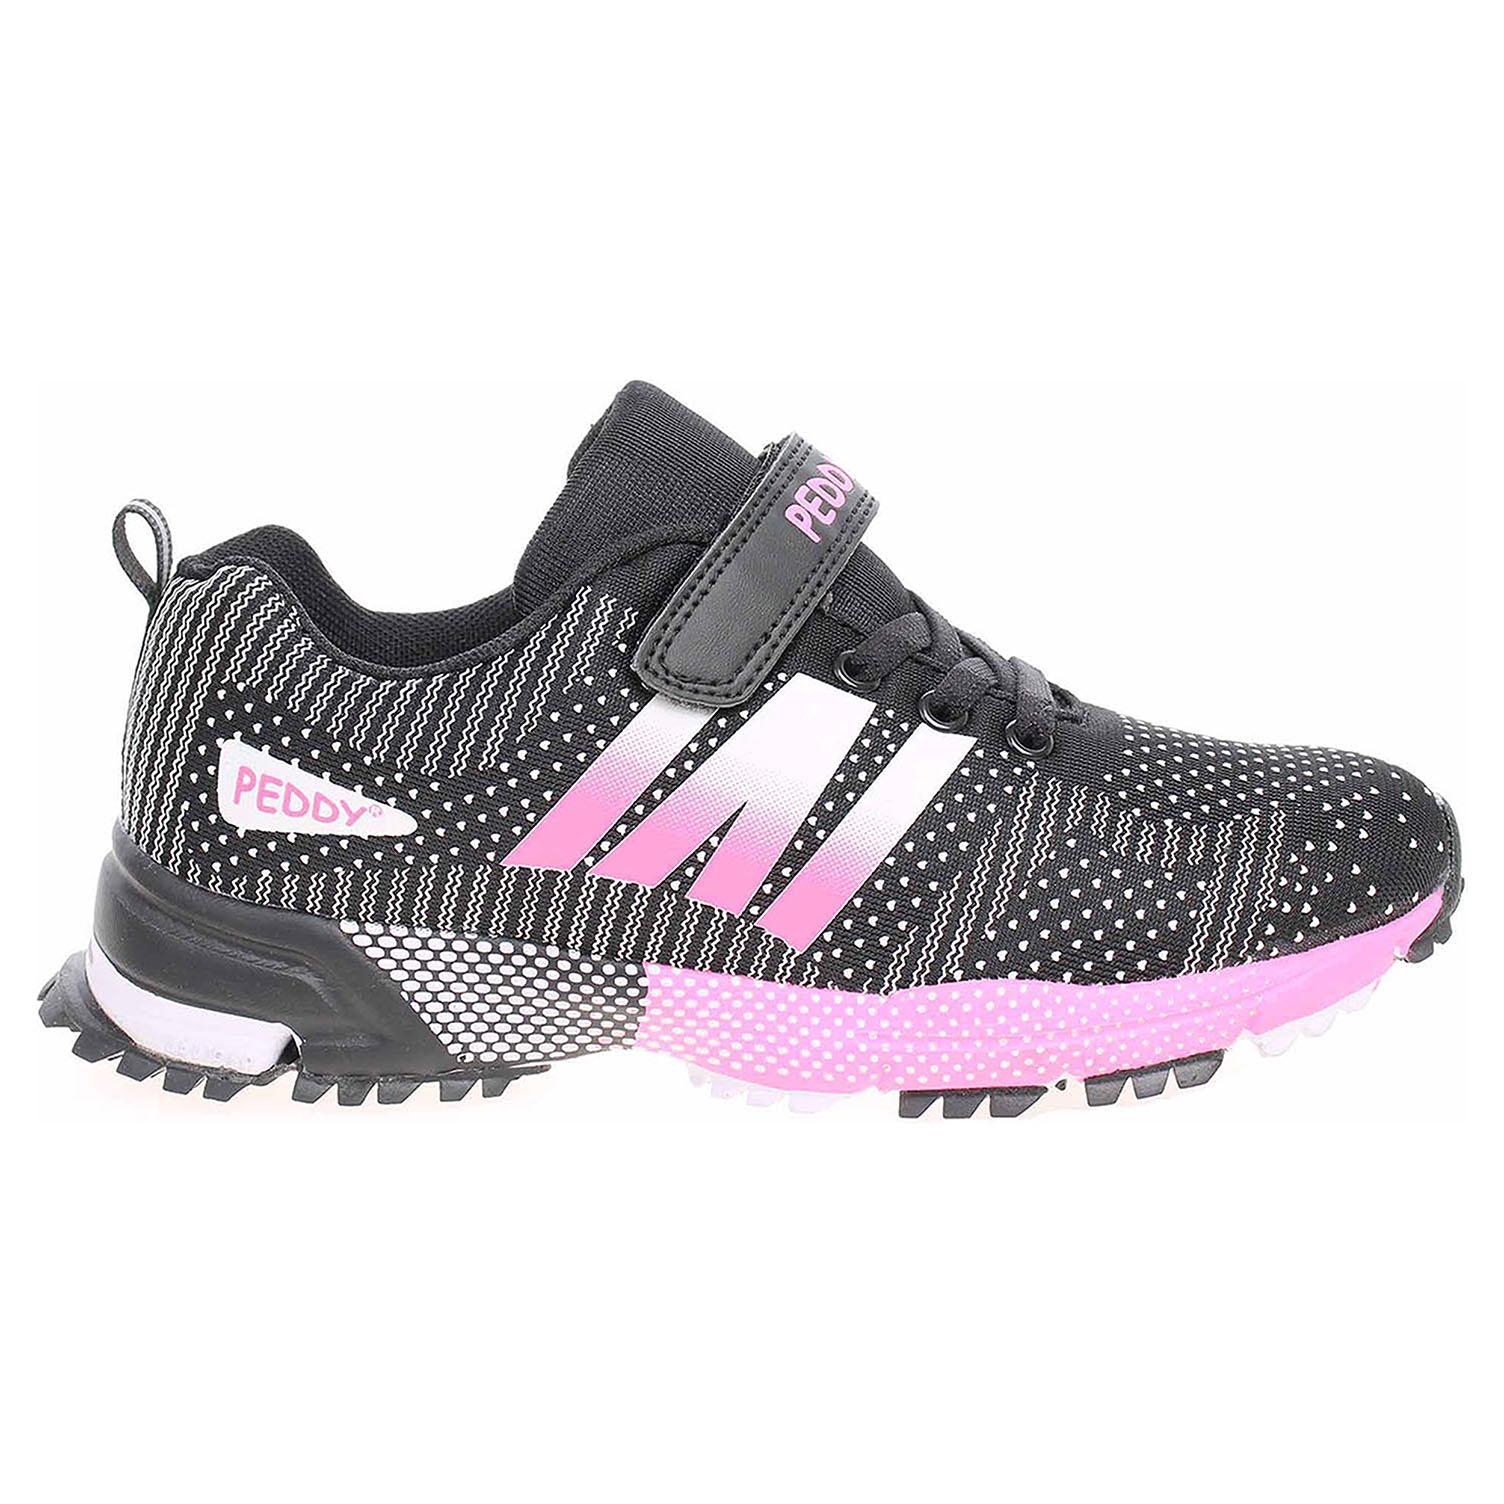 Ecco Peddy dívčí obuv P0-507-25-01 pink 26500054 98e37396a6